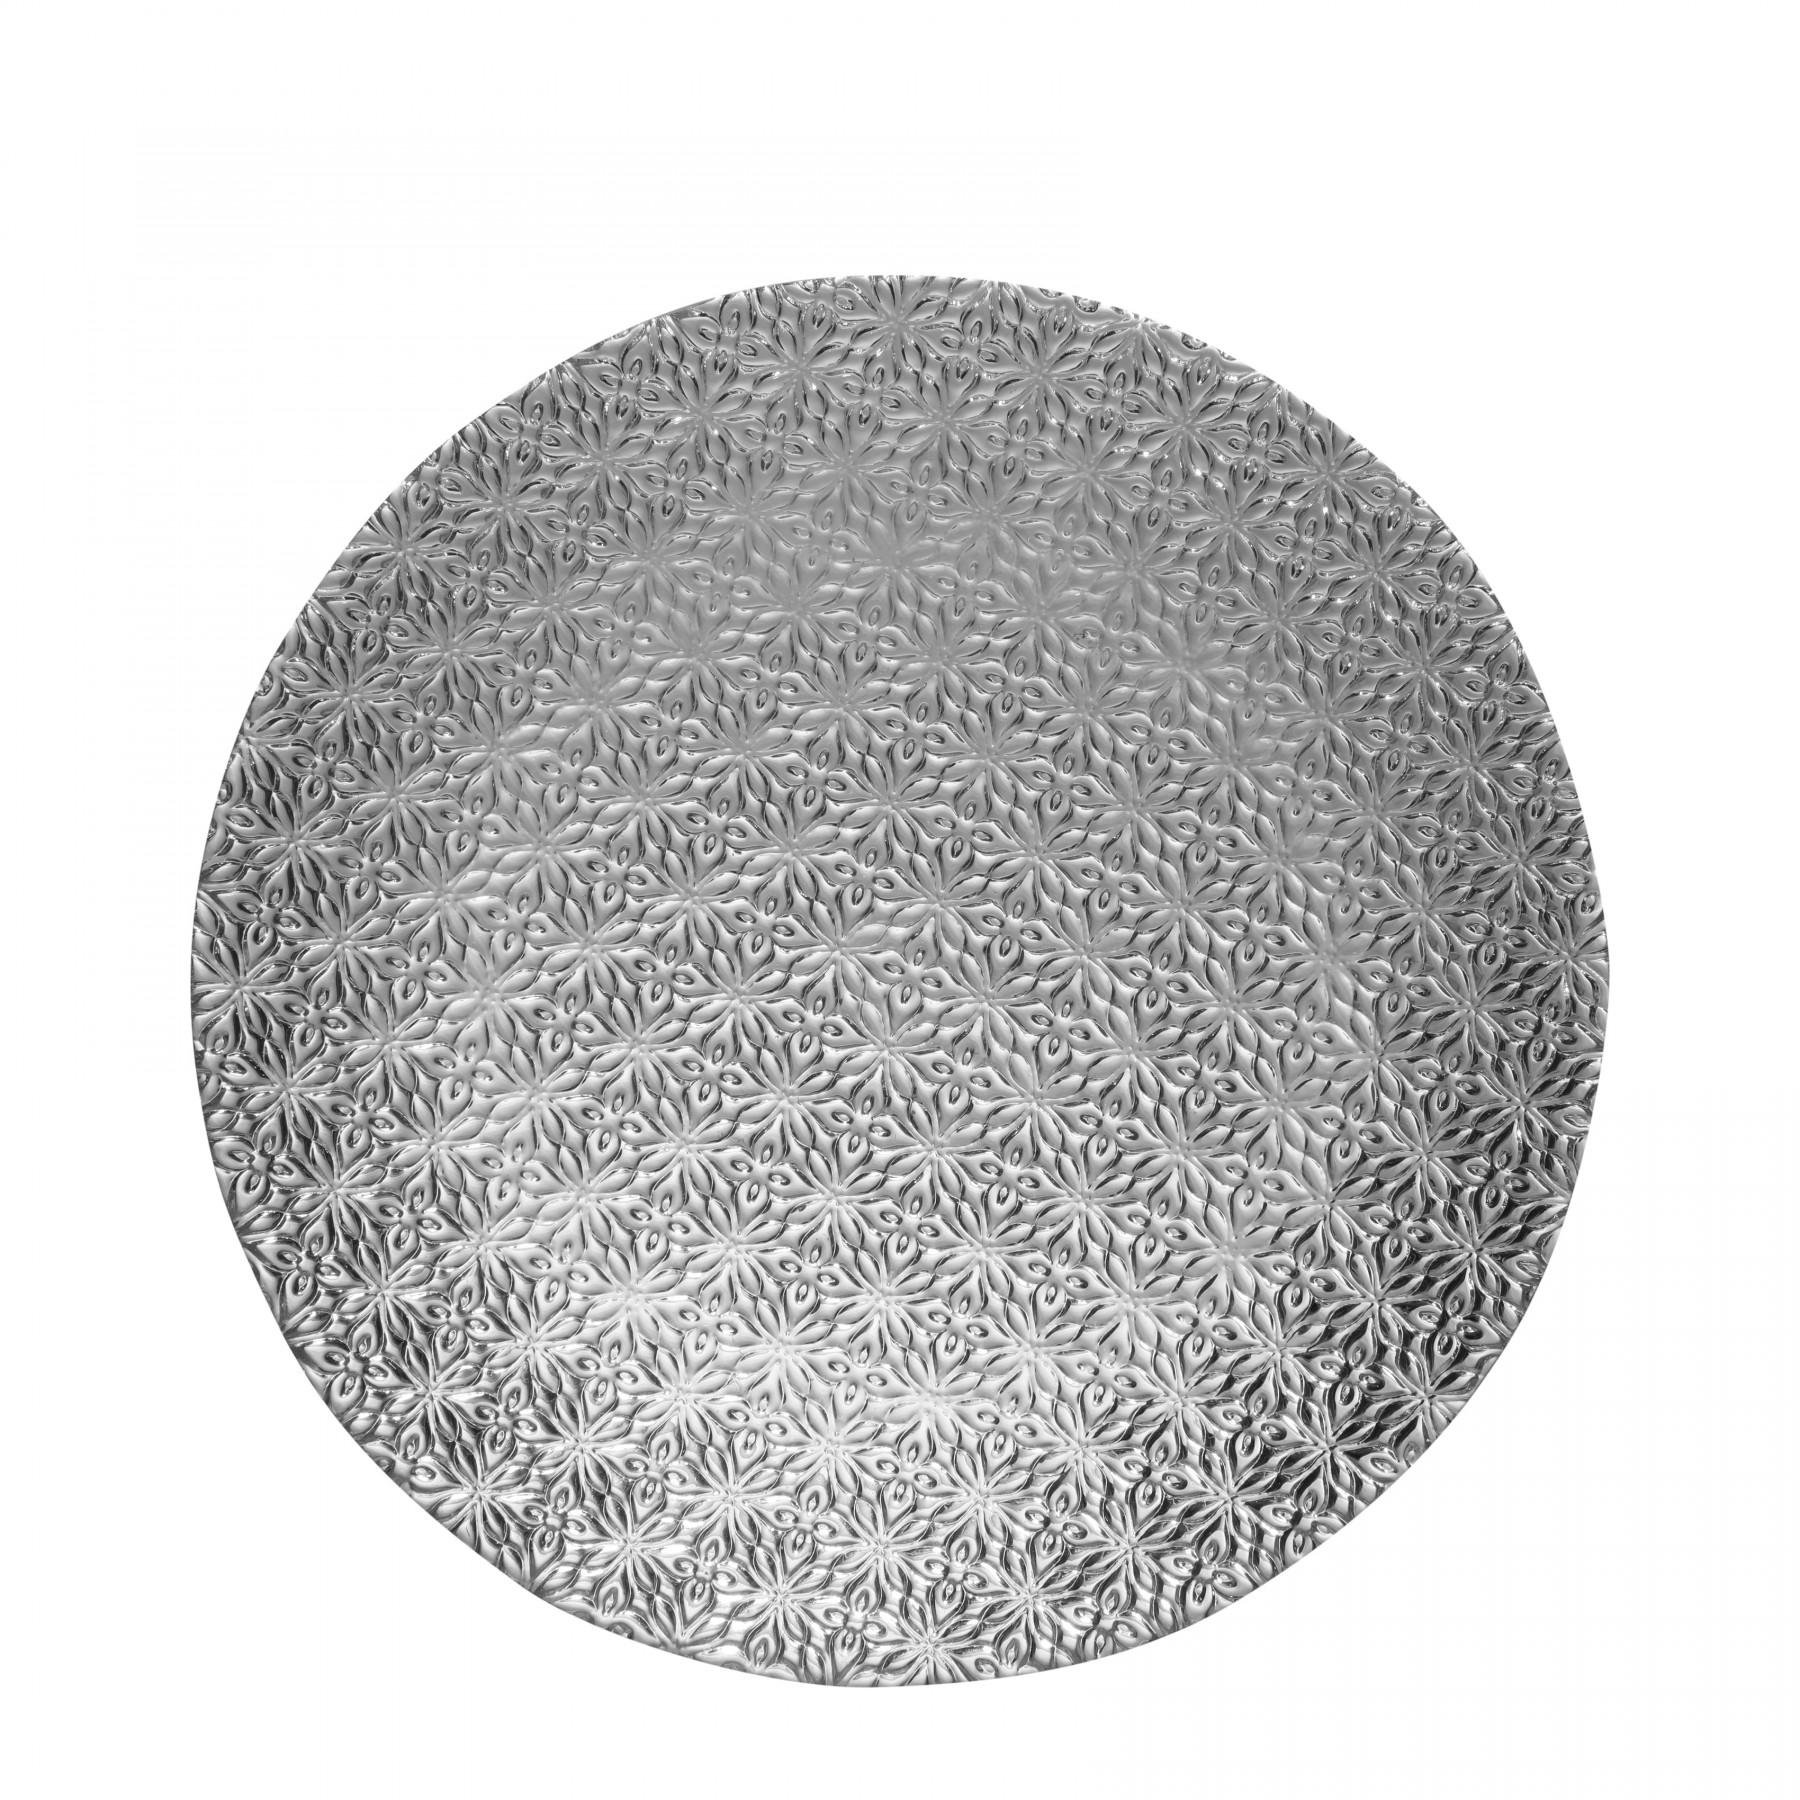 Milesia - assiette de presentation  en verre 28cm